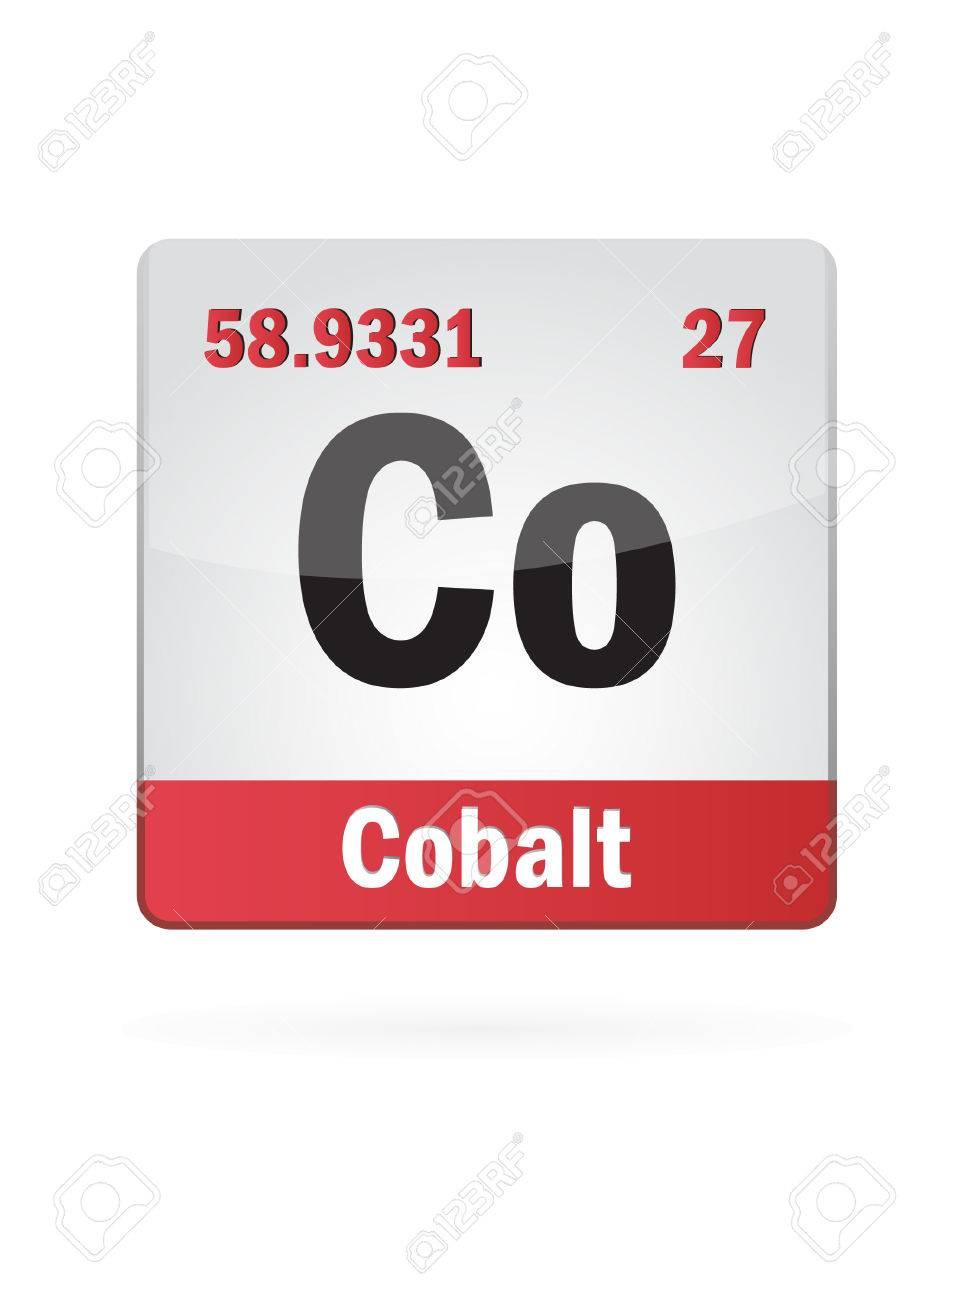 Cobalt Symbol Illustration Icon Stock Vector - 23652176